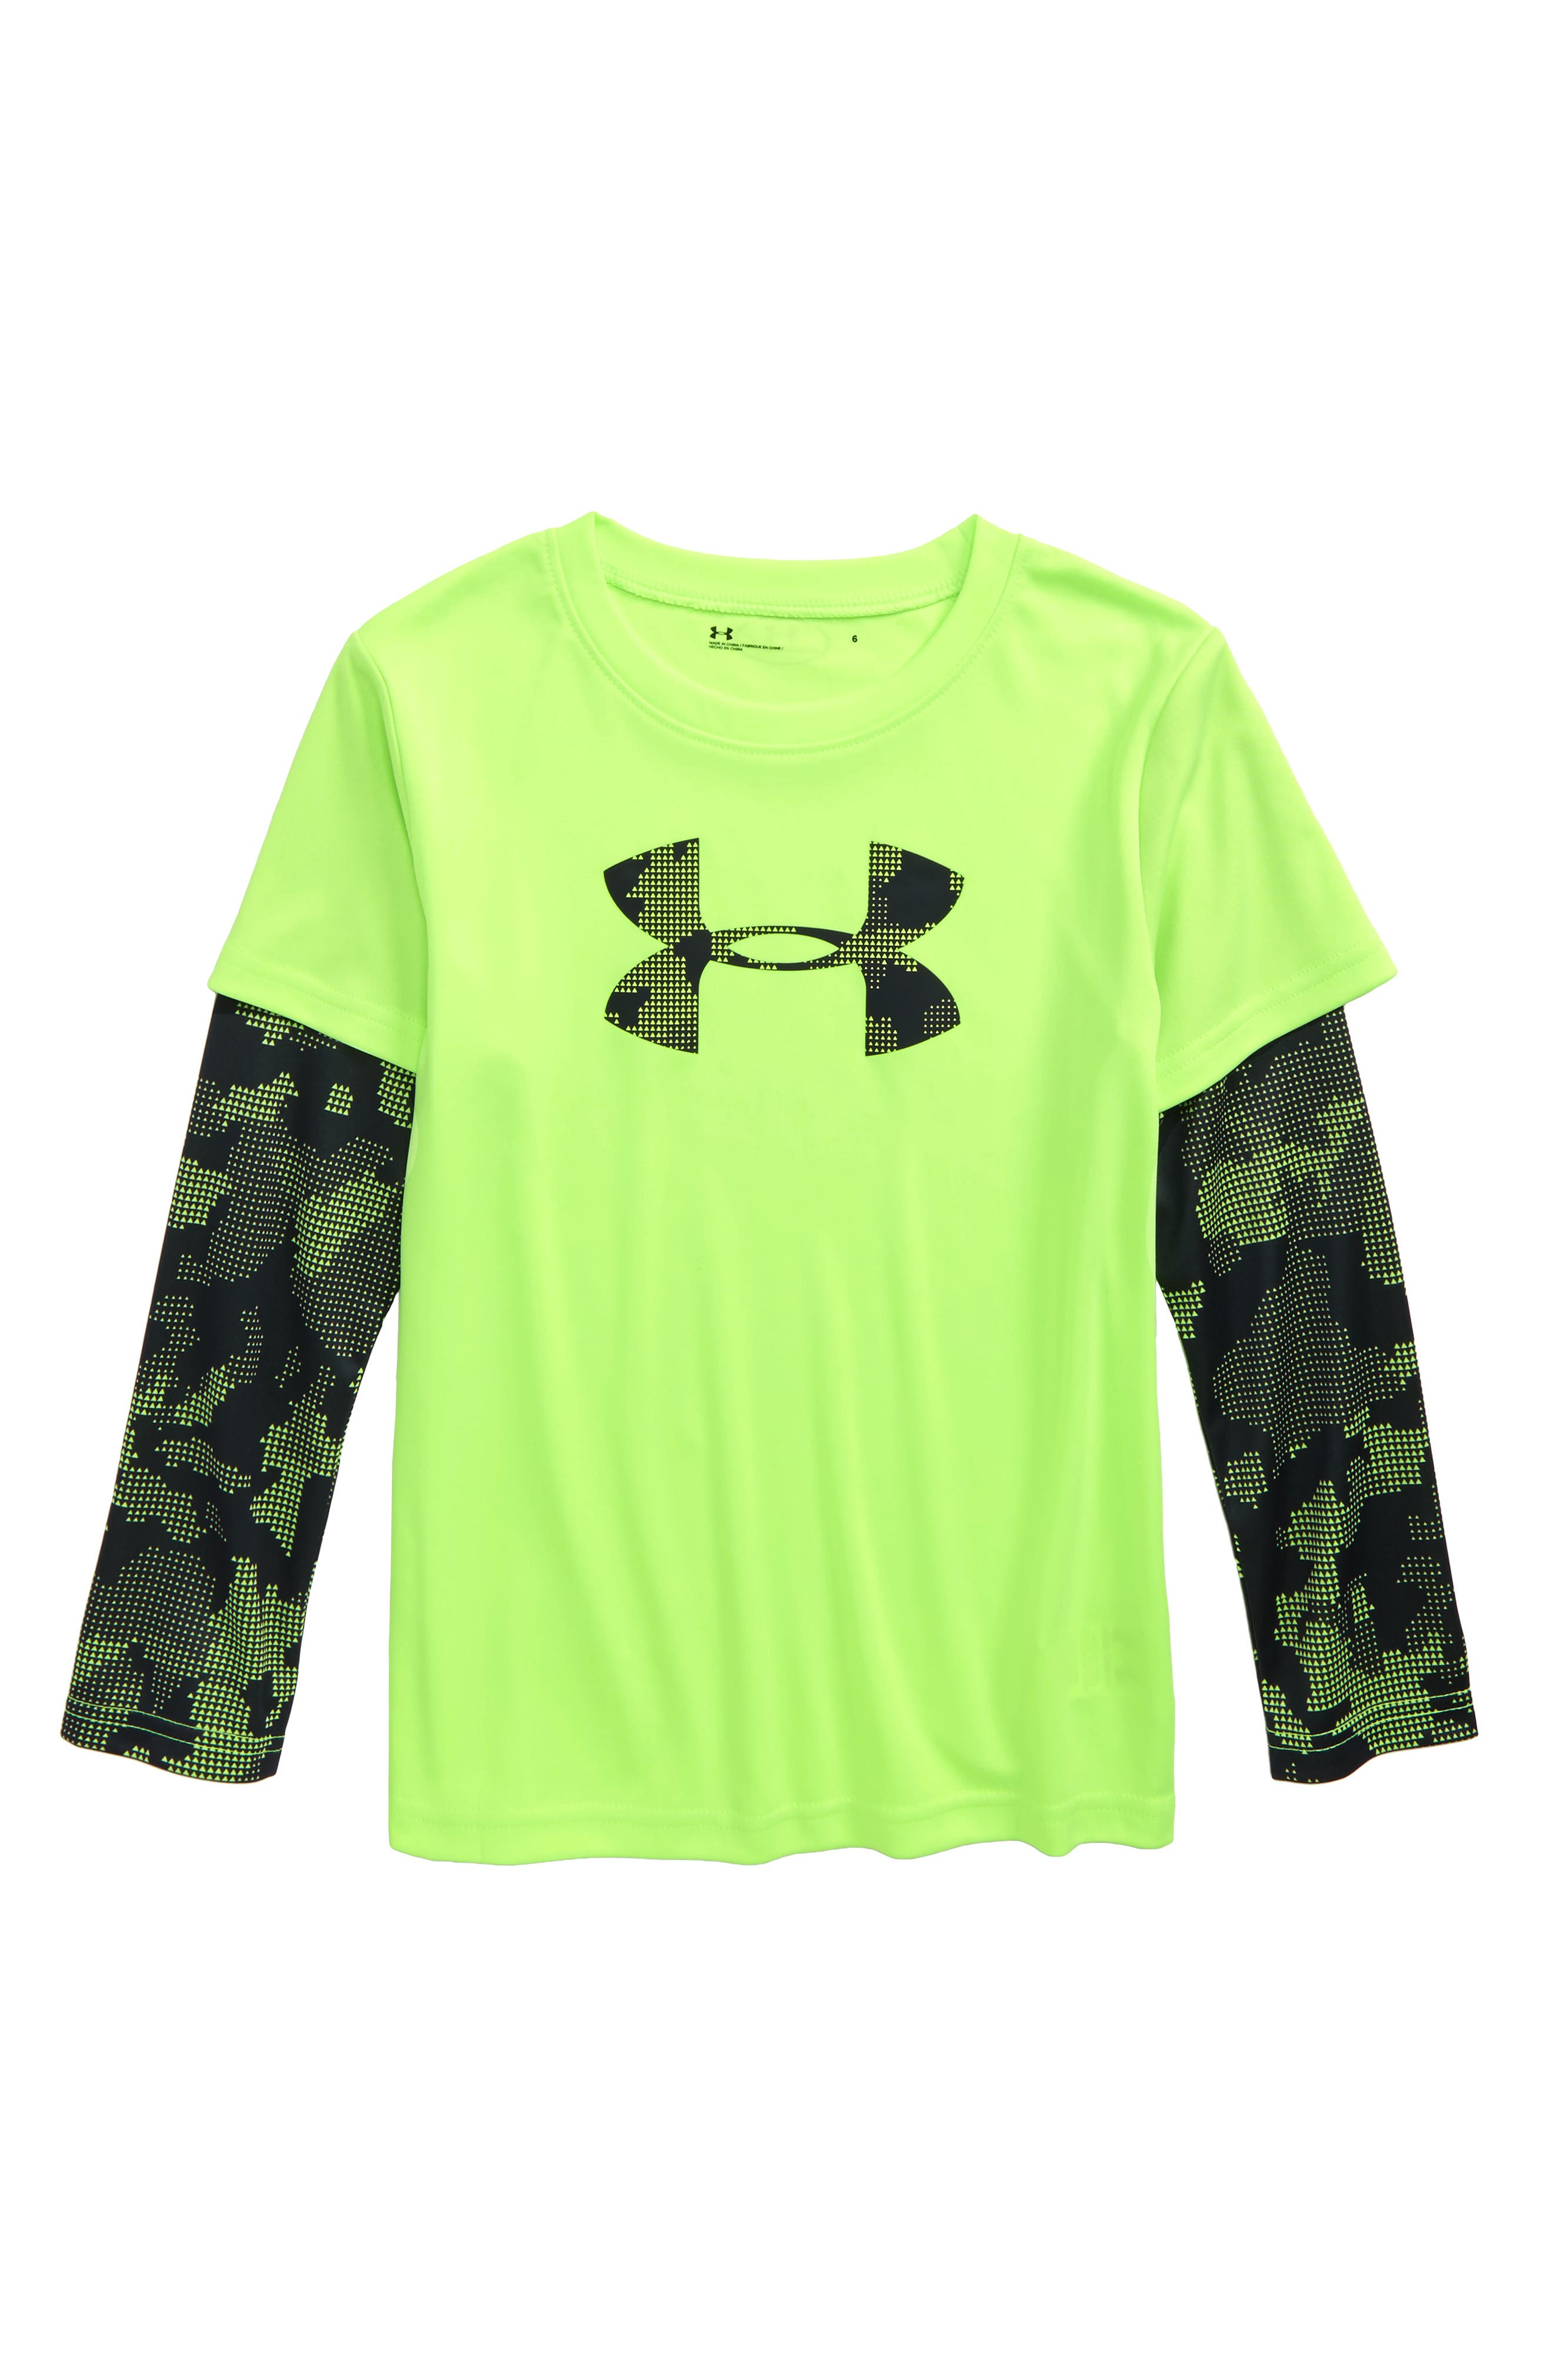 Main Image - Under Armour Utility Layered Long Sleeve T-Shirt (Toddler Boys & Little Boys)